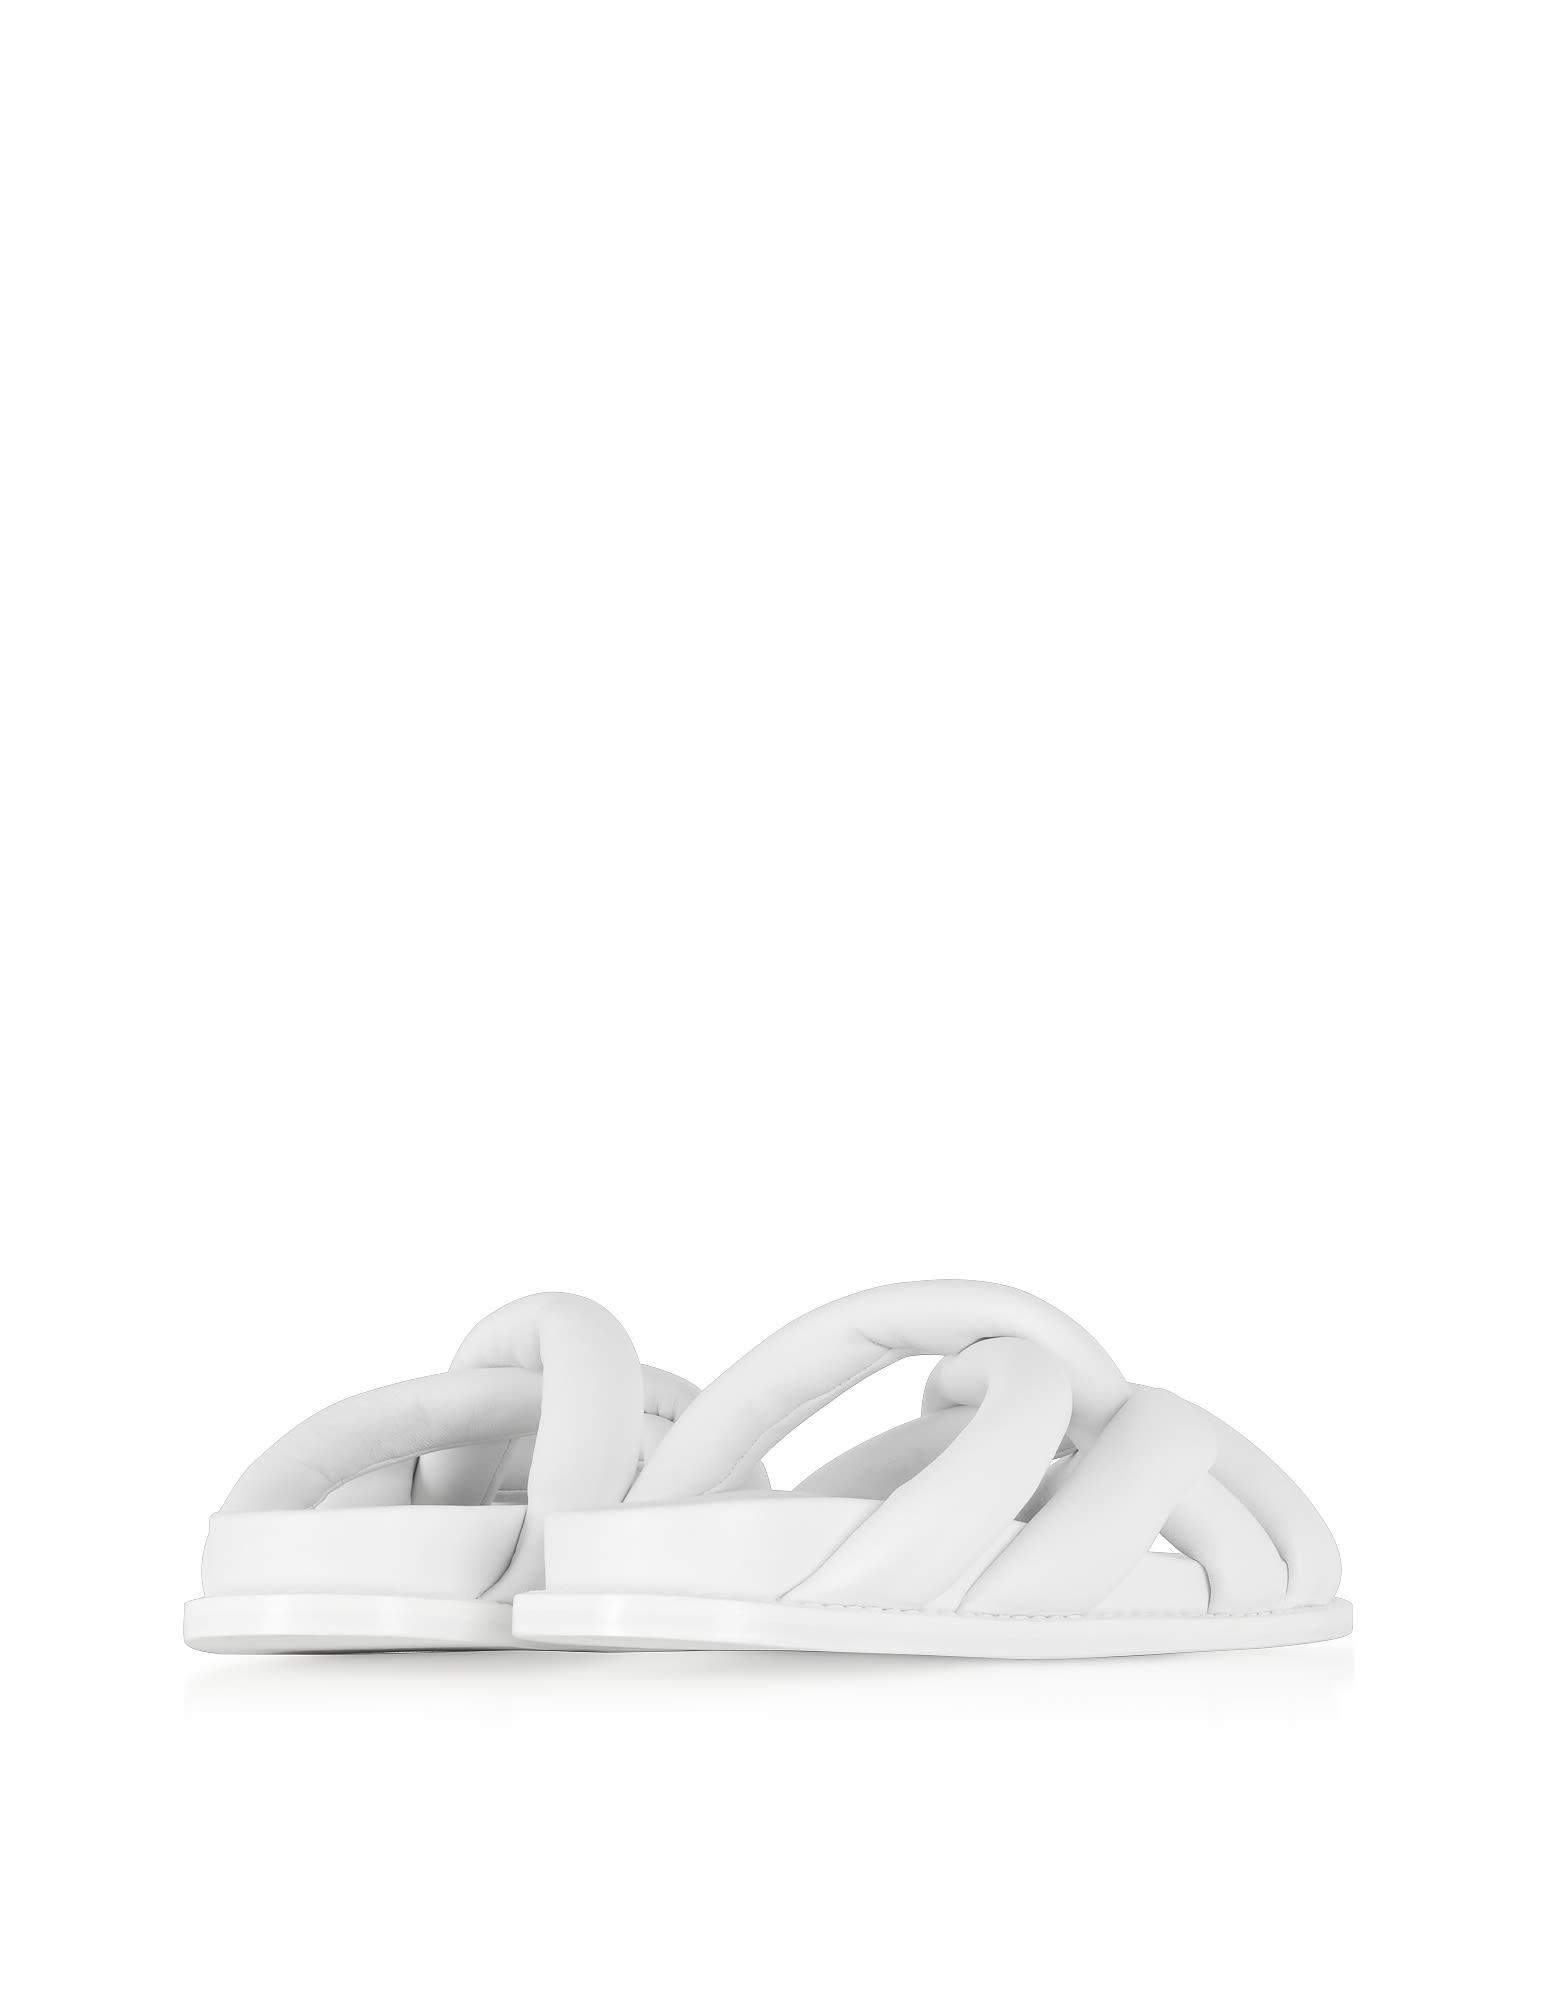 Proenza Schouler Shoes, Optic Suede Flat Sandals